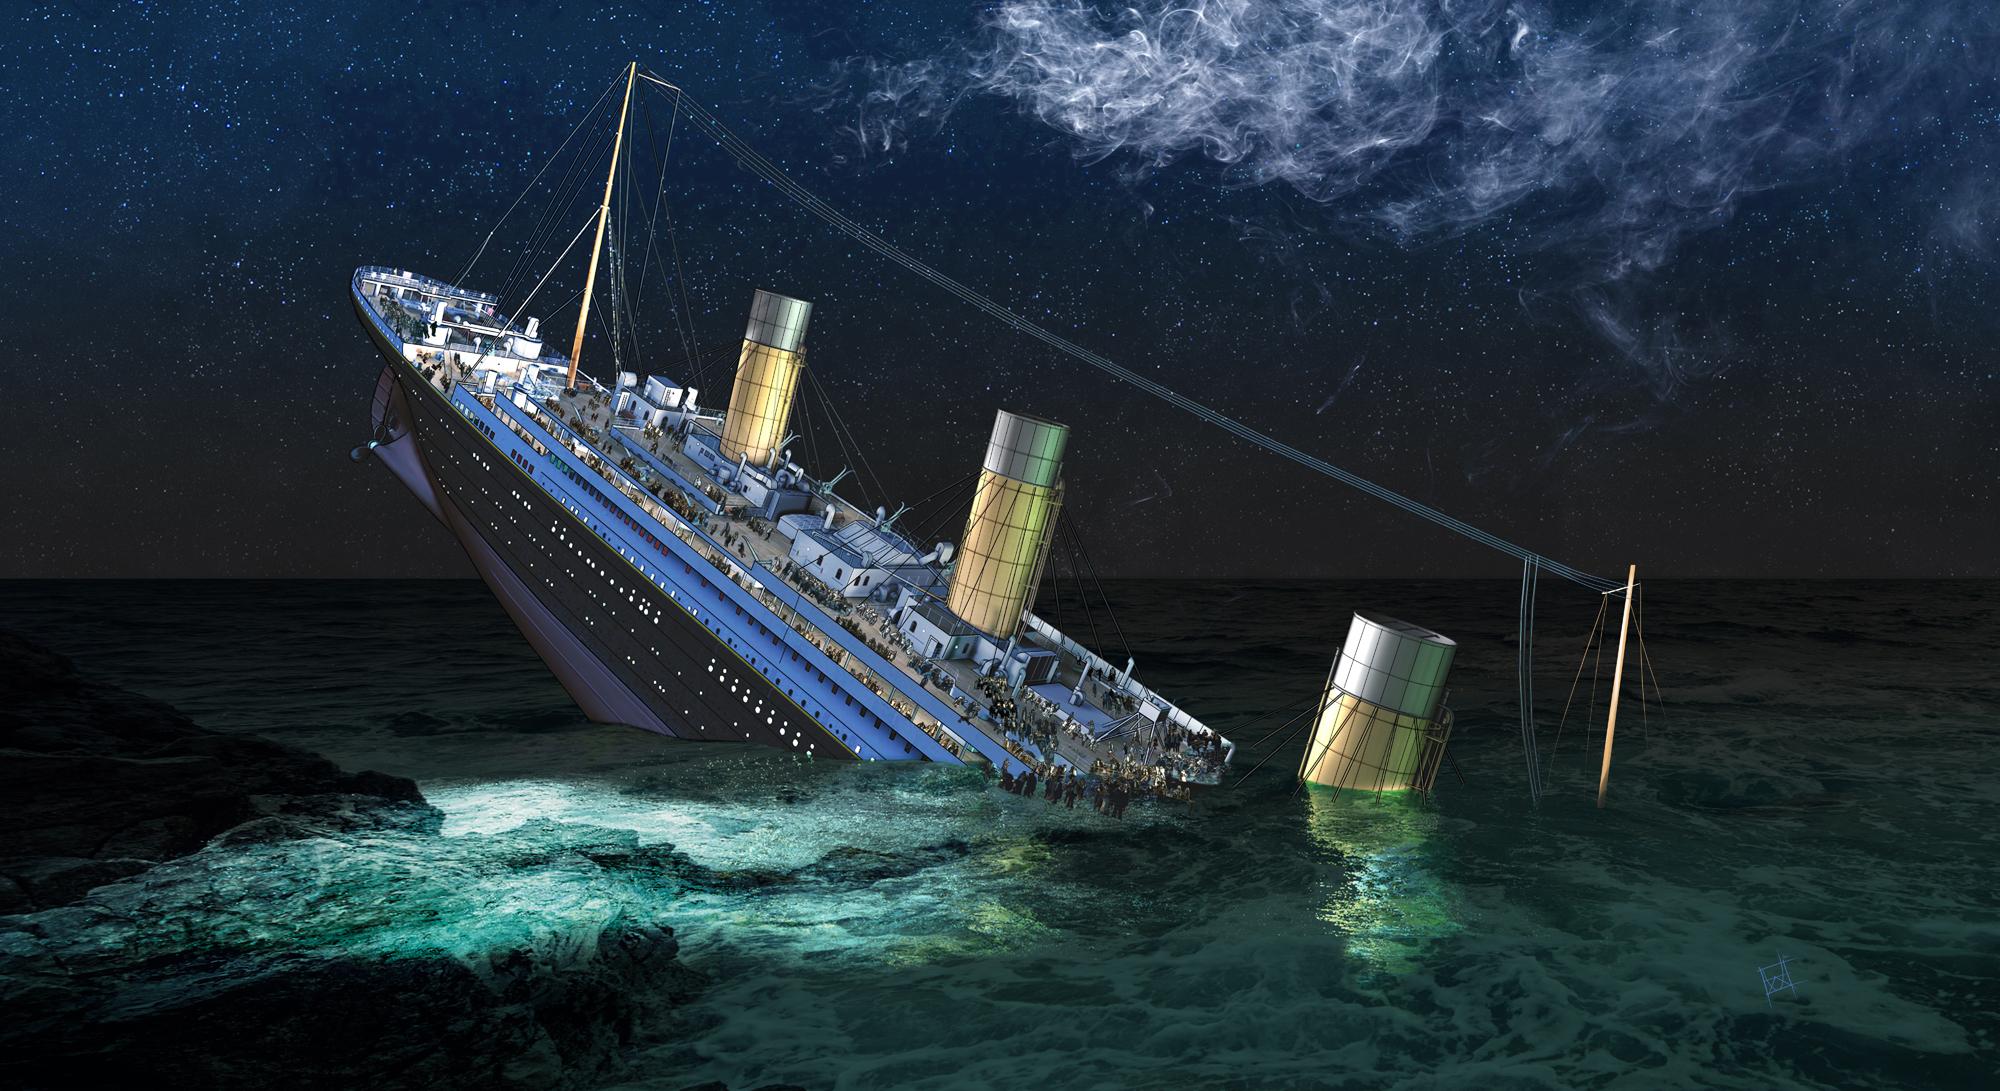 Titanic Sinking Environment Concept by DimitarKatsarov on ...